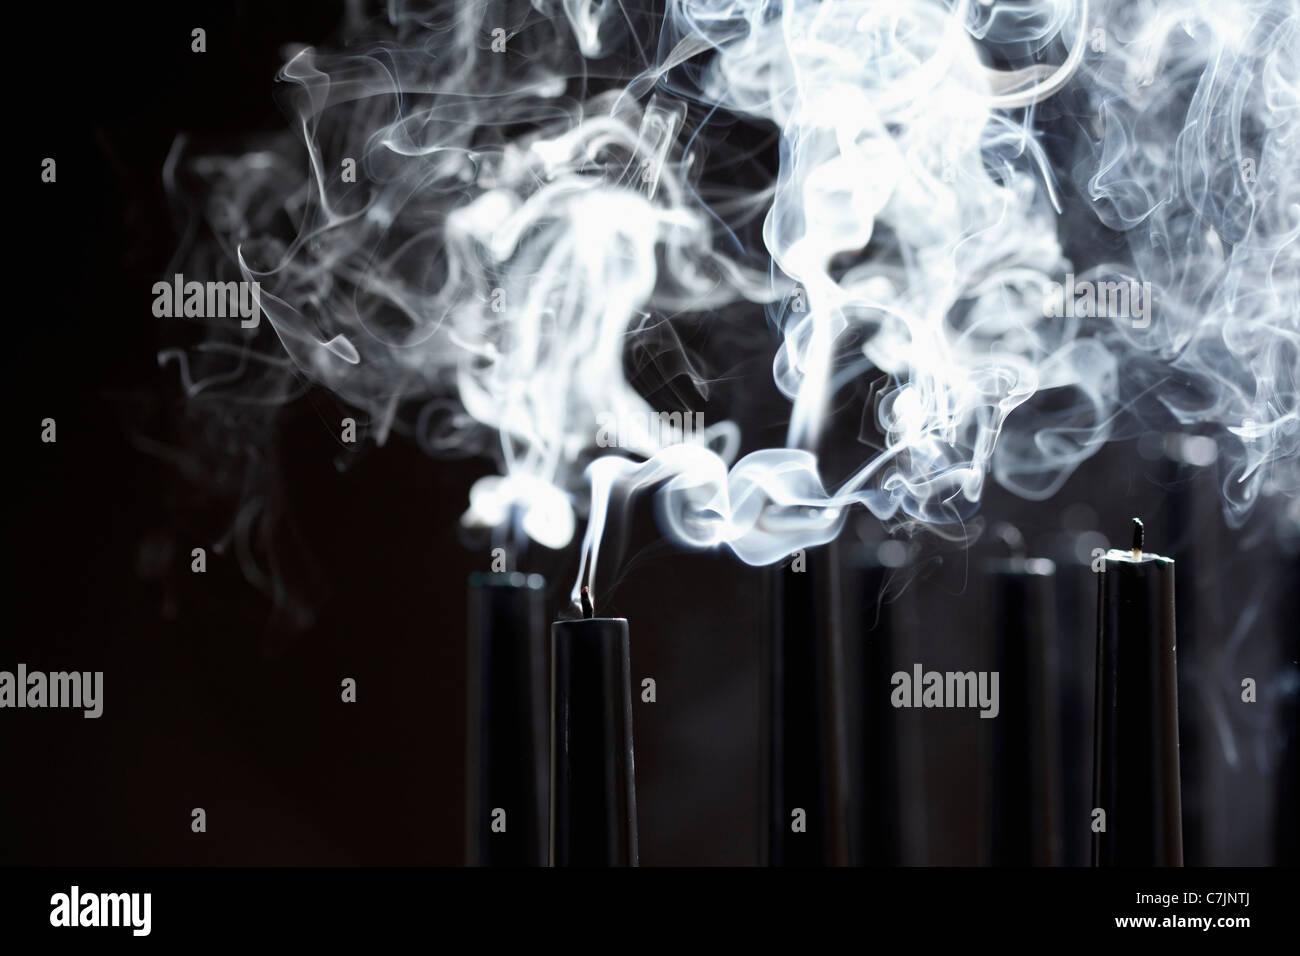 Close up of smoking black candles - Stock Image